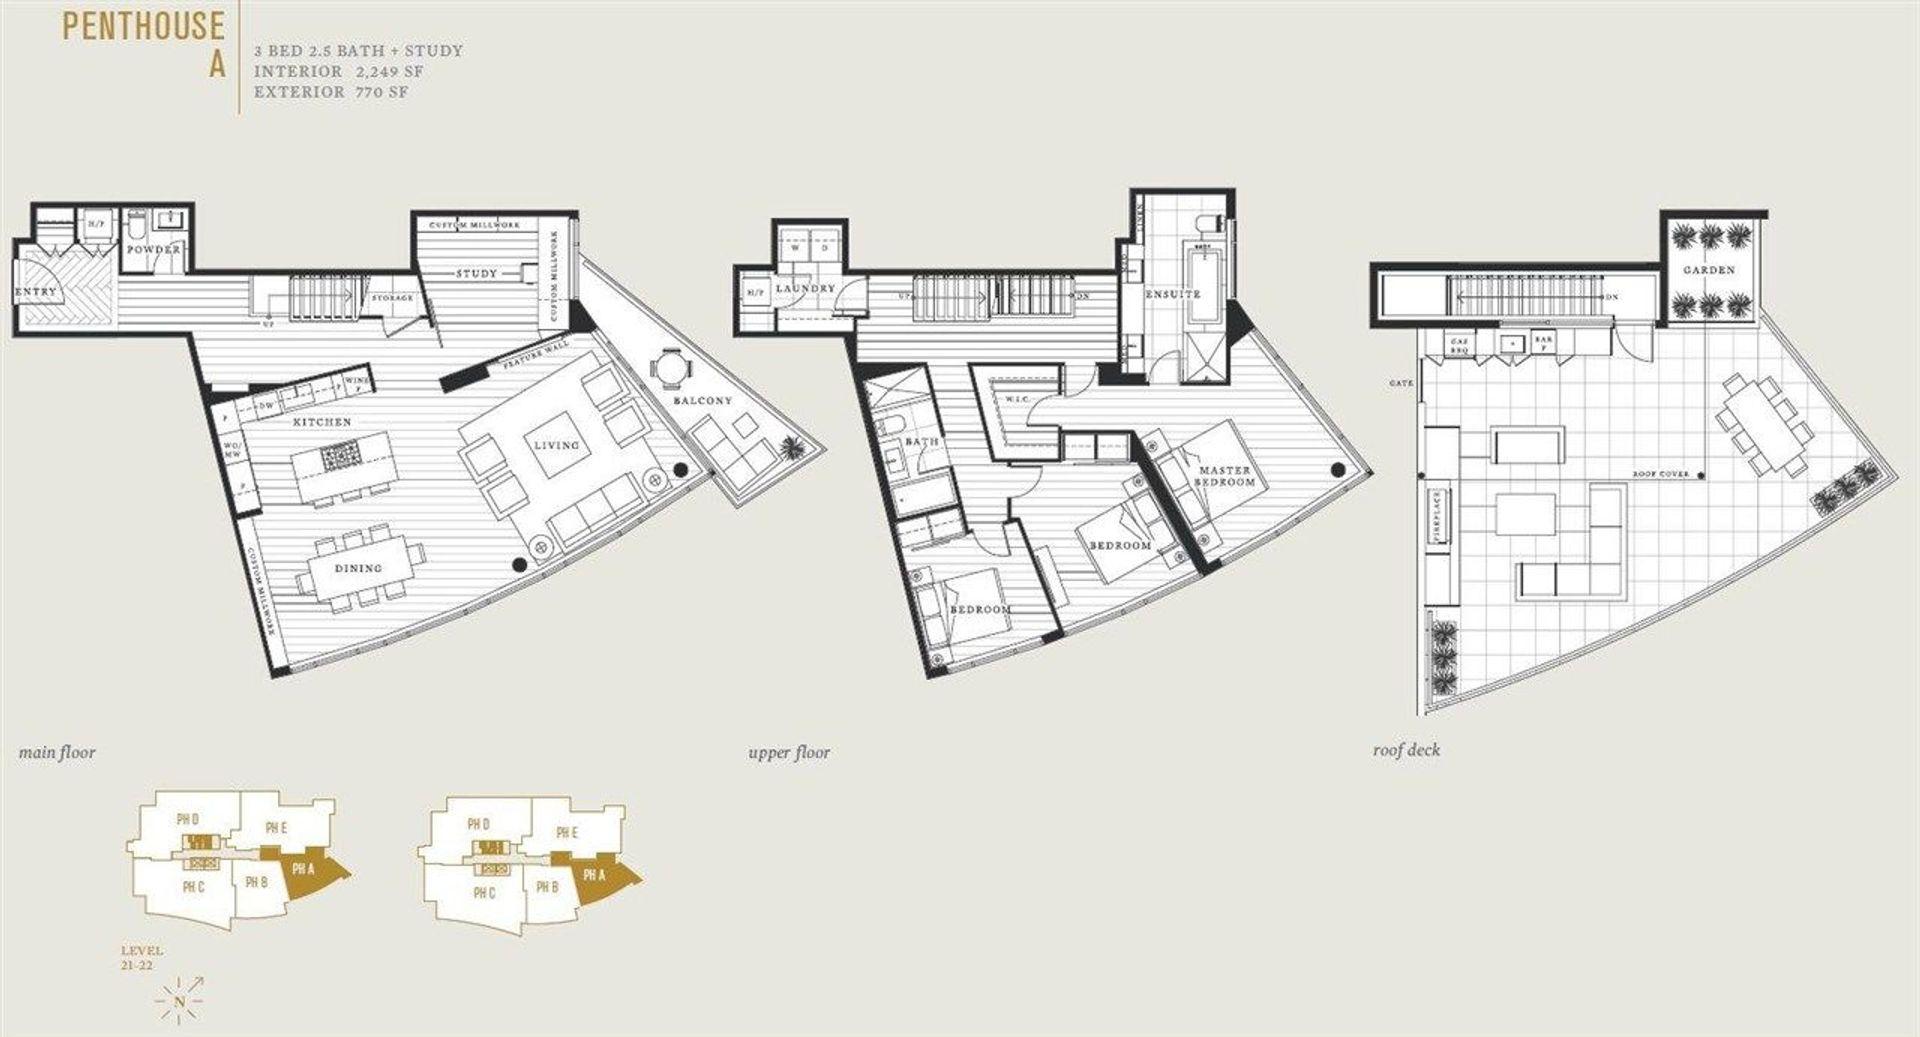 210-salter-street-queensborough-new-westminster-34 at 2103 - 210 Salter Street, Queensborough, New Westminster